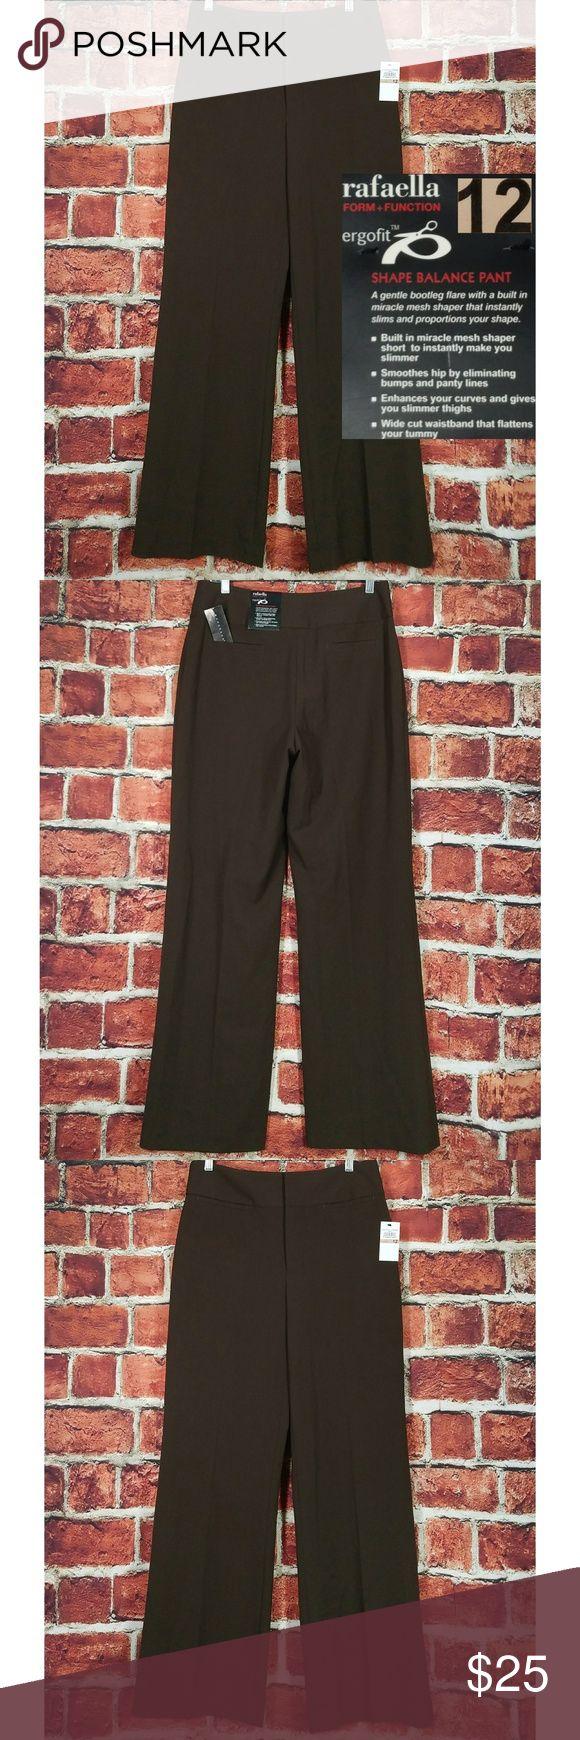 Rafella NWT Sz 12 x 32 Rafaella Women Pants Flat Dress Boot Cut Size 12 Inseam 32 Brown Trousers Slacks  Condition: Brand New Photos are best description  Size: 12 Waist: 32 Front Rise: 11.5 Back Rise: 16 Hips: 41 Inseam: 32.5 Leg Opening: 11 Rafaella Pants Trousers